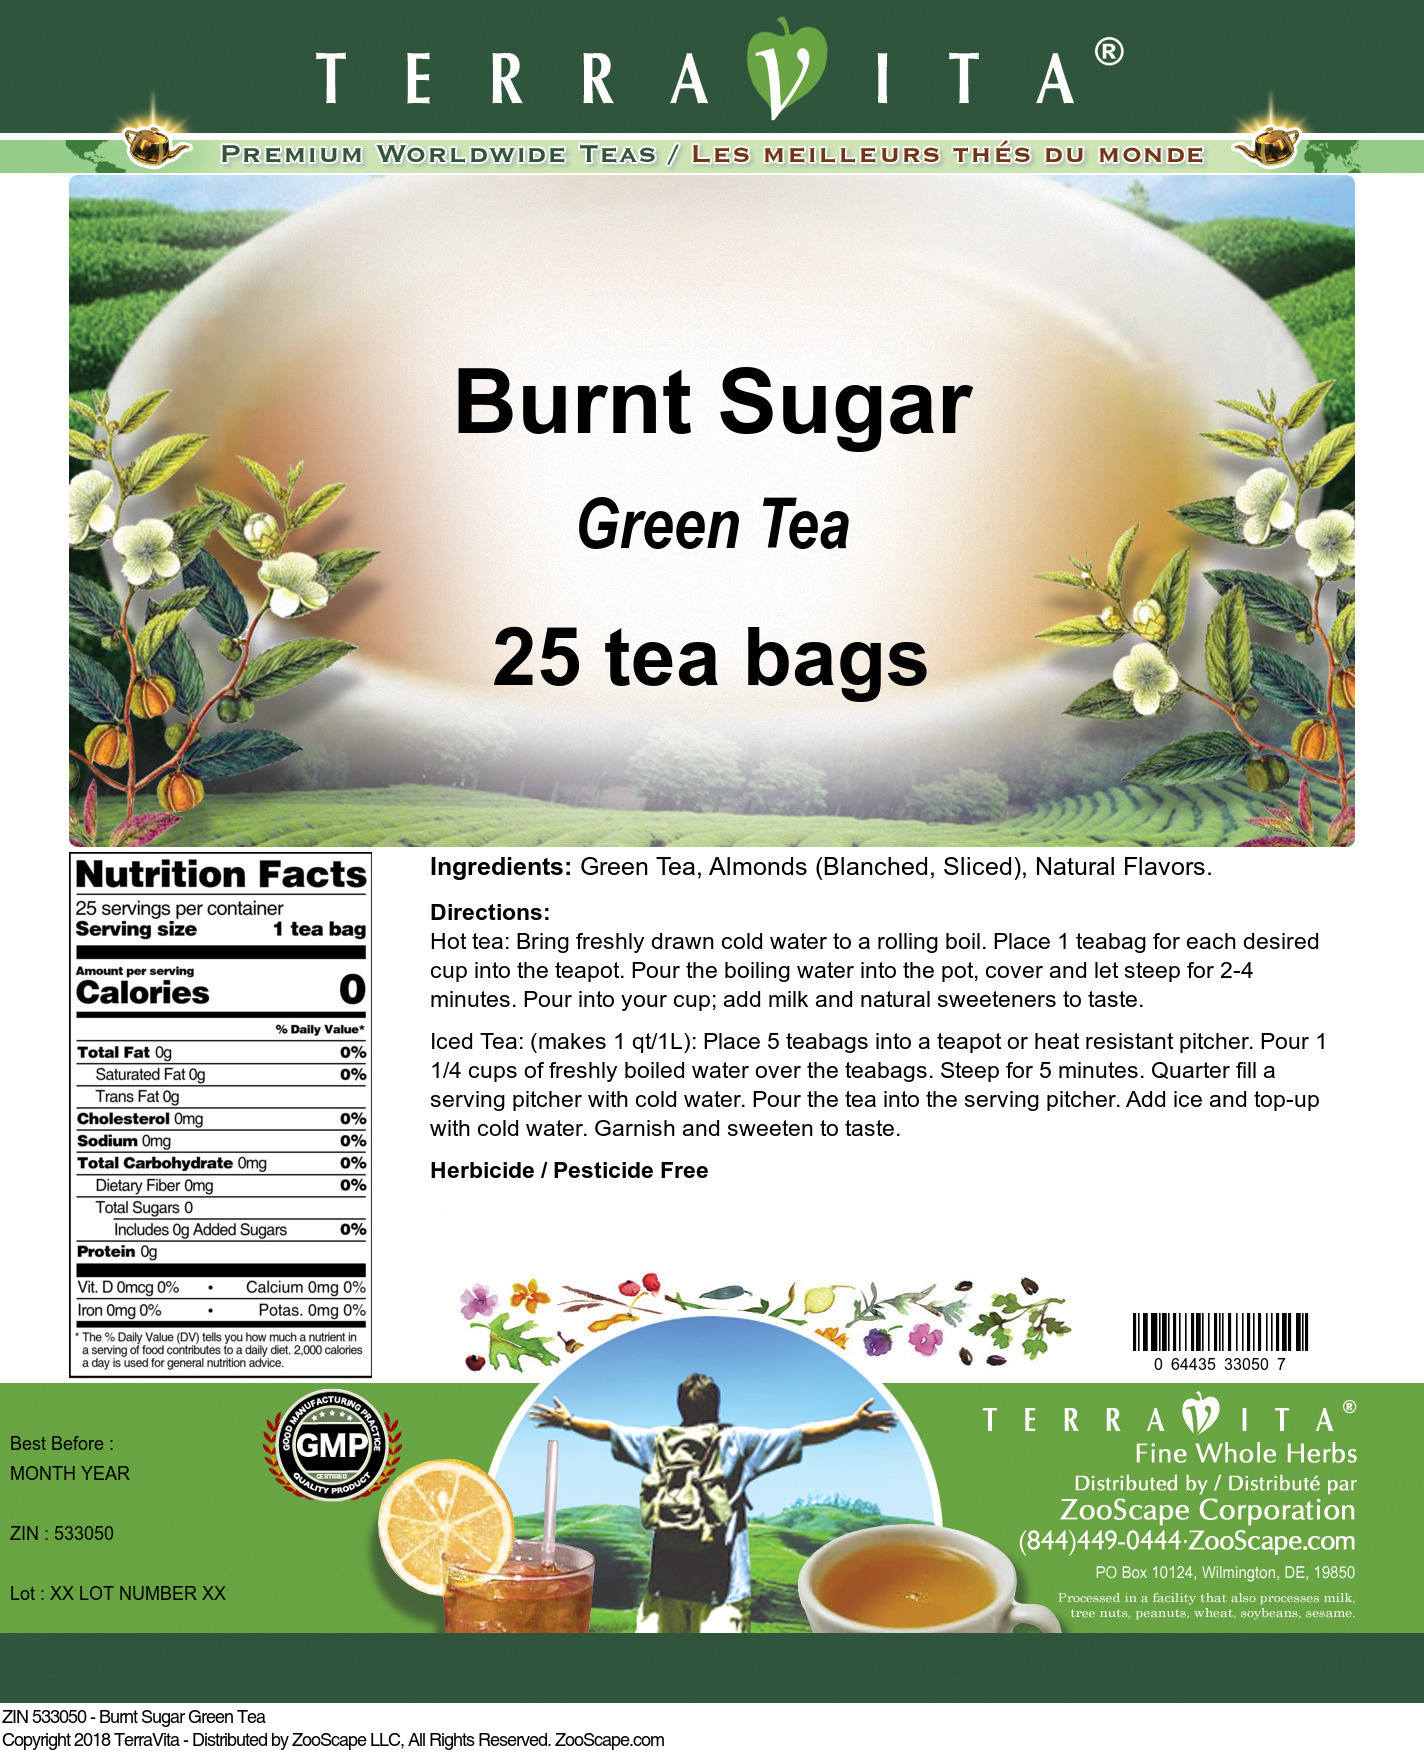 Burnt Sugar Green Tea